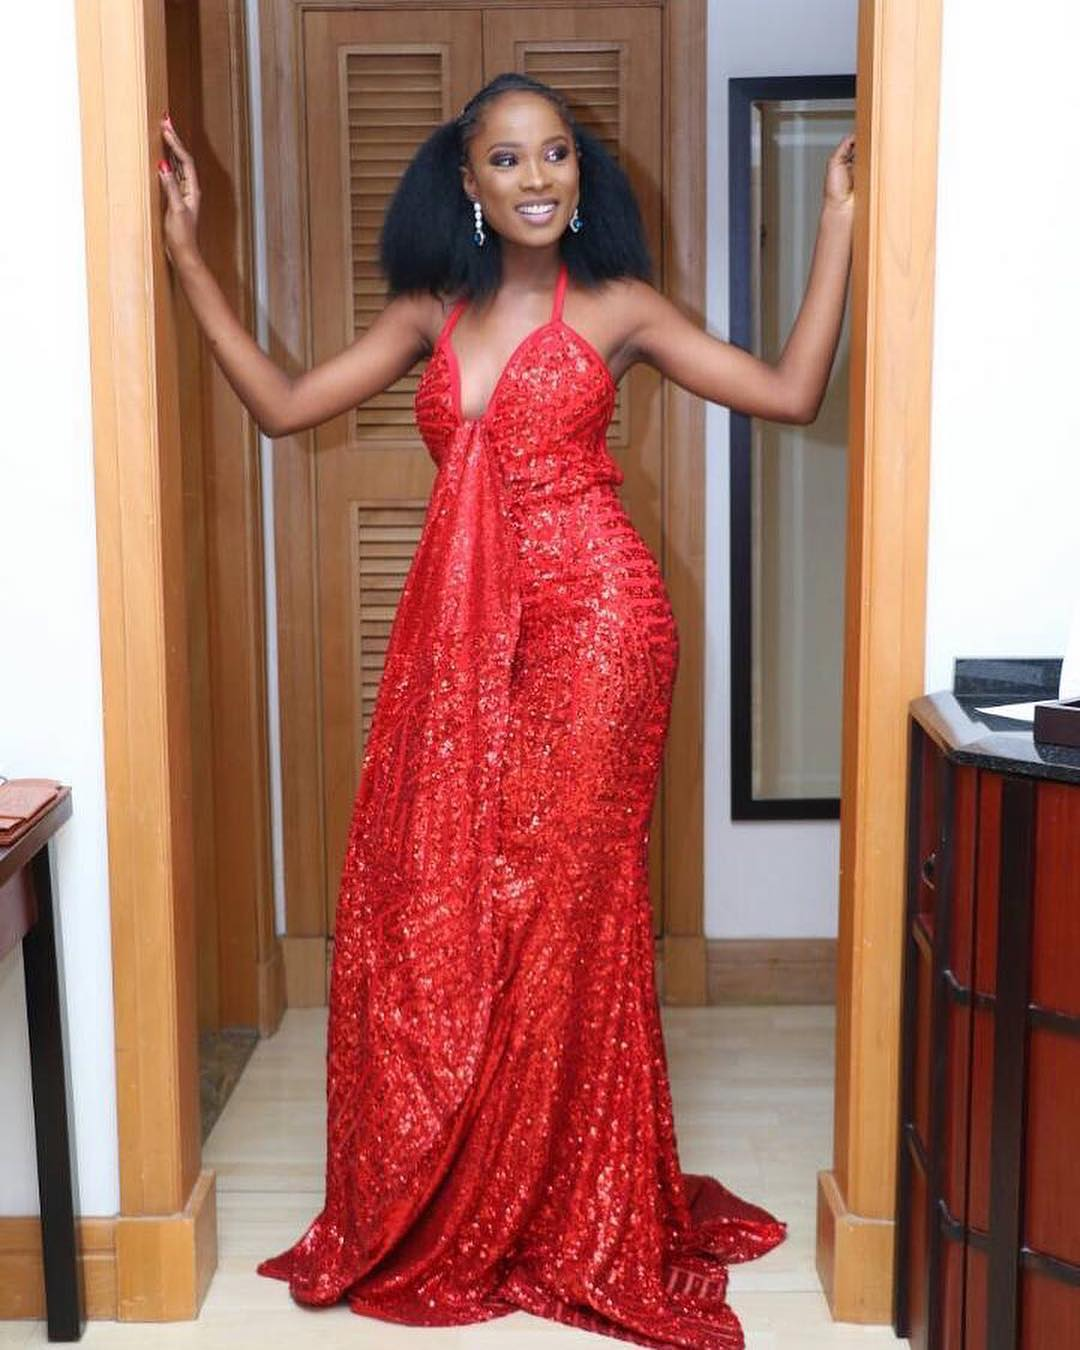 25013653_150870792215610_8270755046585532416_n Photos: Celebrities at The Future Awards Africa 2017 | #TFAA2017 Celebrities Entertainment